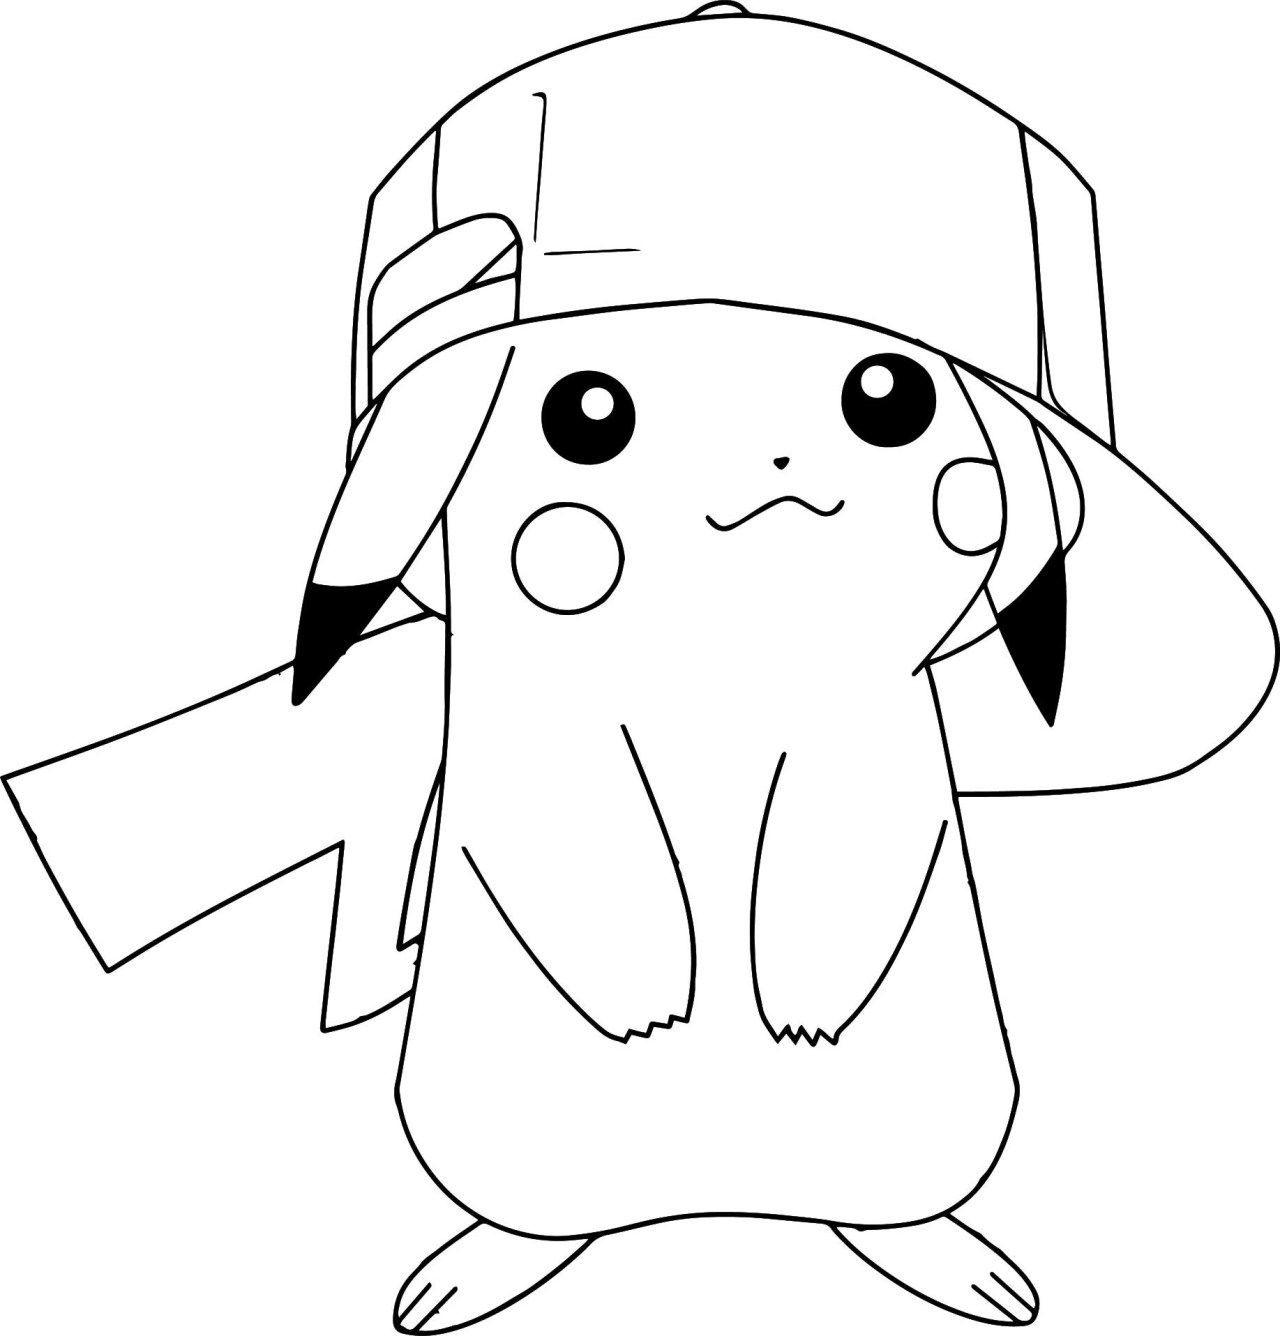 Free Printable Pokemon Coloring Pages Pokemon Coloring Pages Printable Free Printable Pokemon Coloring Entitlementtrap Com Pikachu Coloring Page Pokemon Coloring Sheets Cartoon Coloring Pages